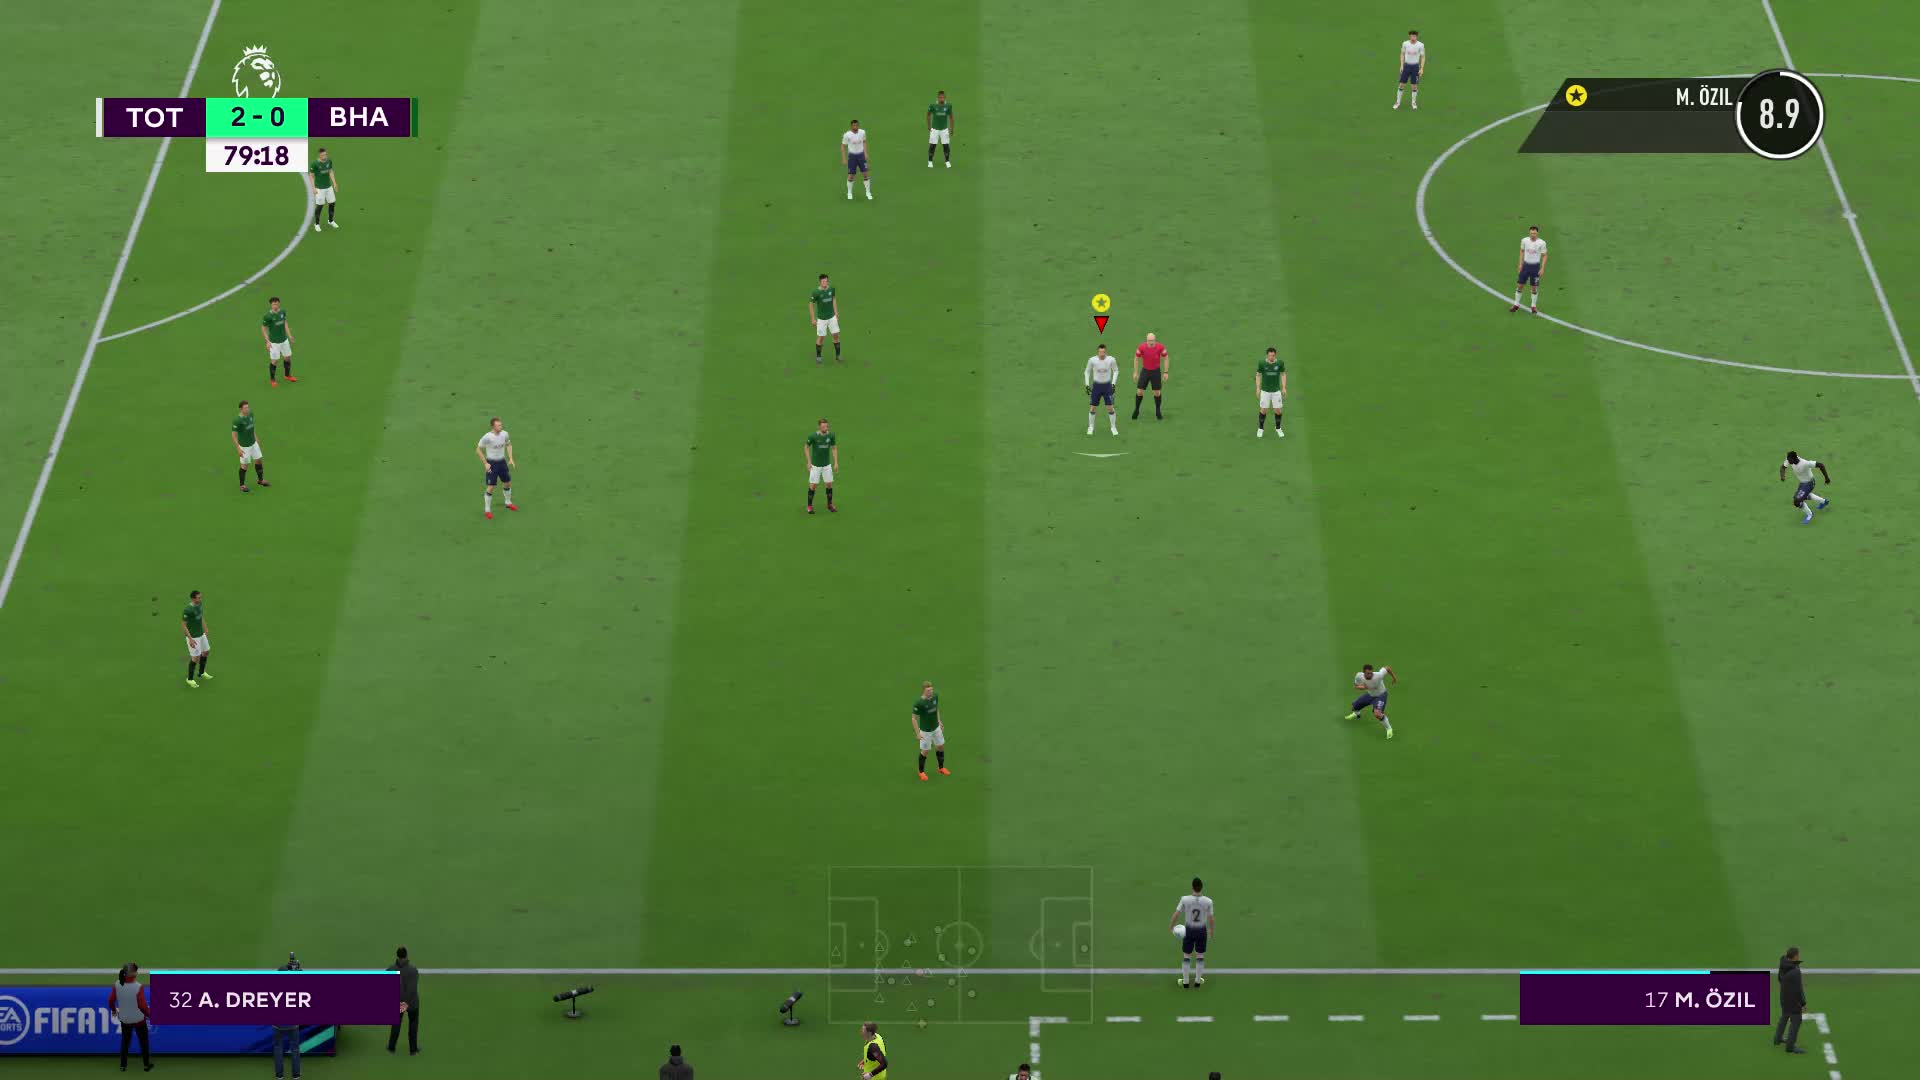 fifa, soccer, spy, tottenham hotspur, FIFA 19 2019-07-03 오후 9 21 38 GIFs